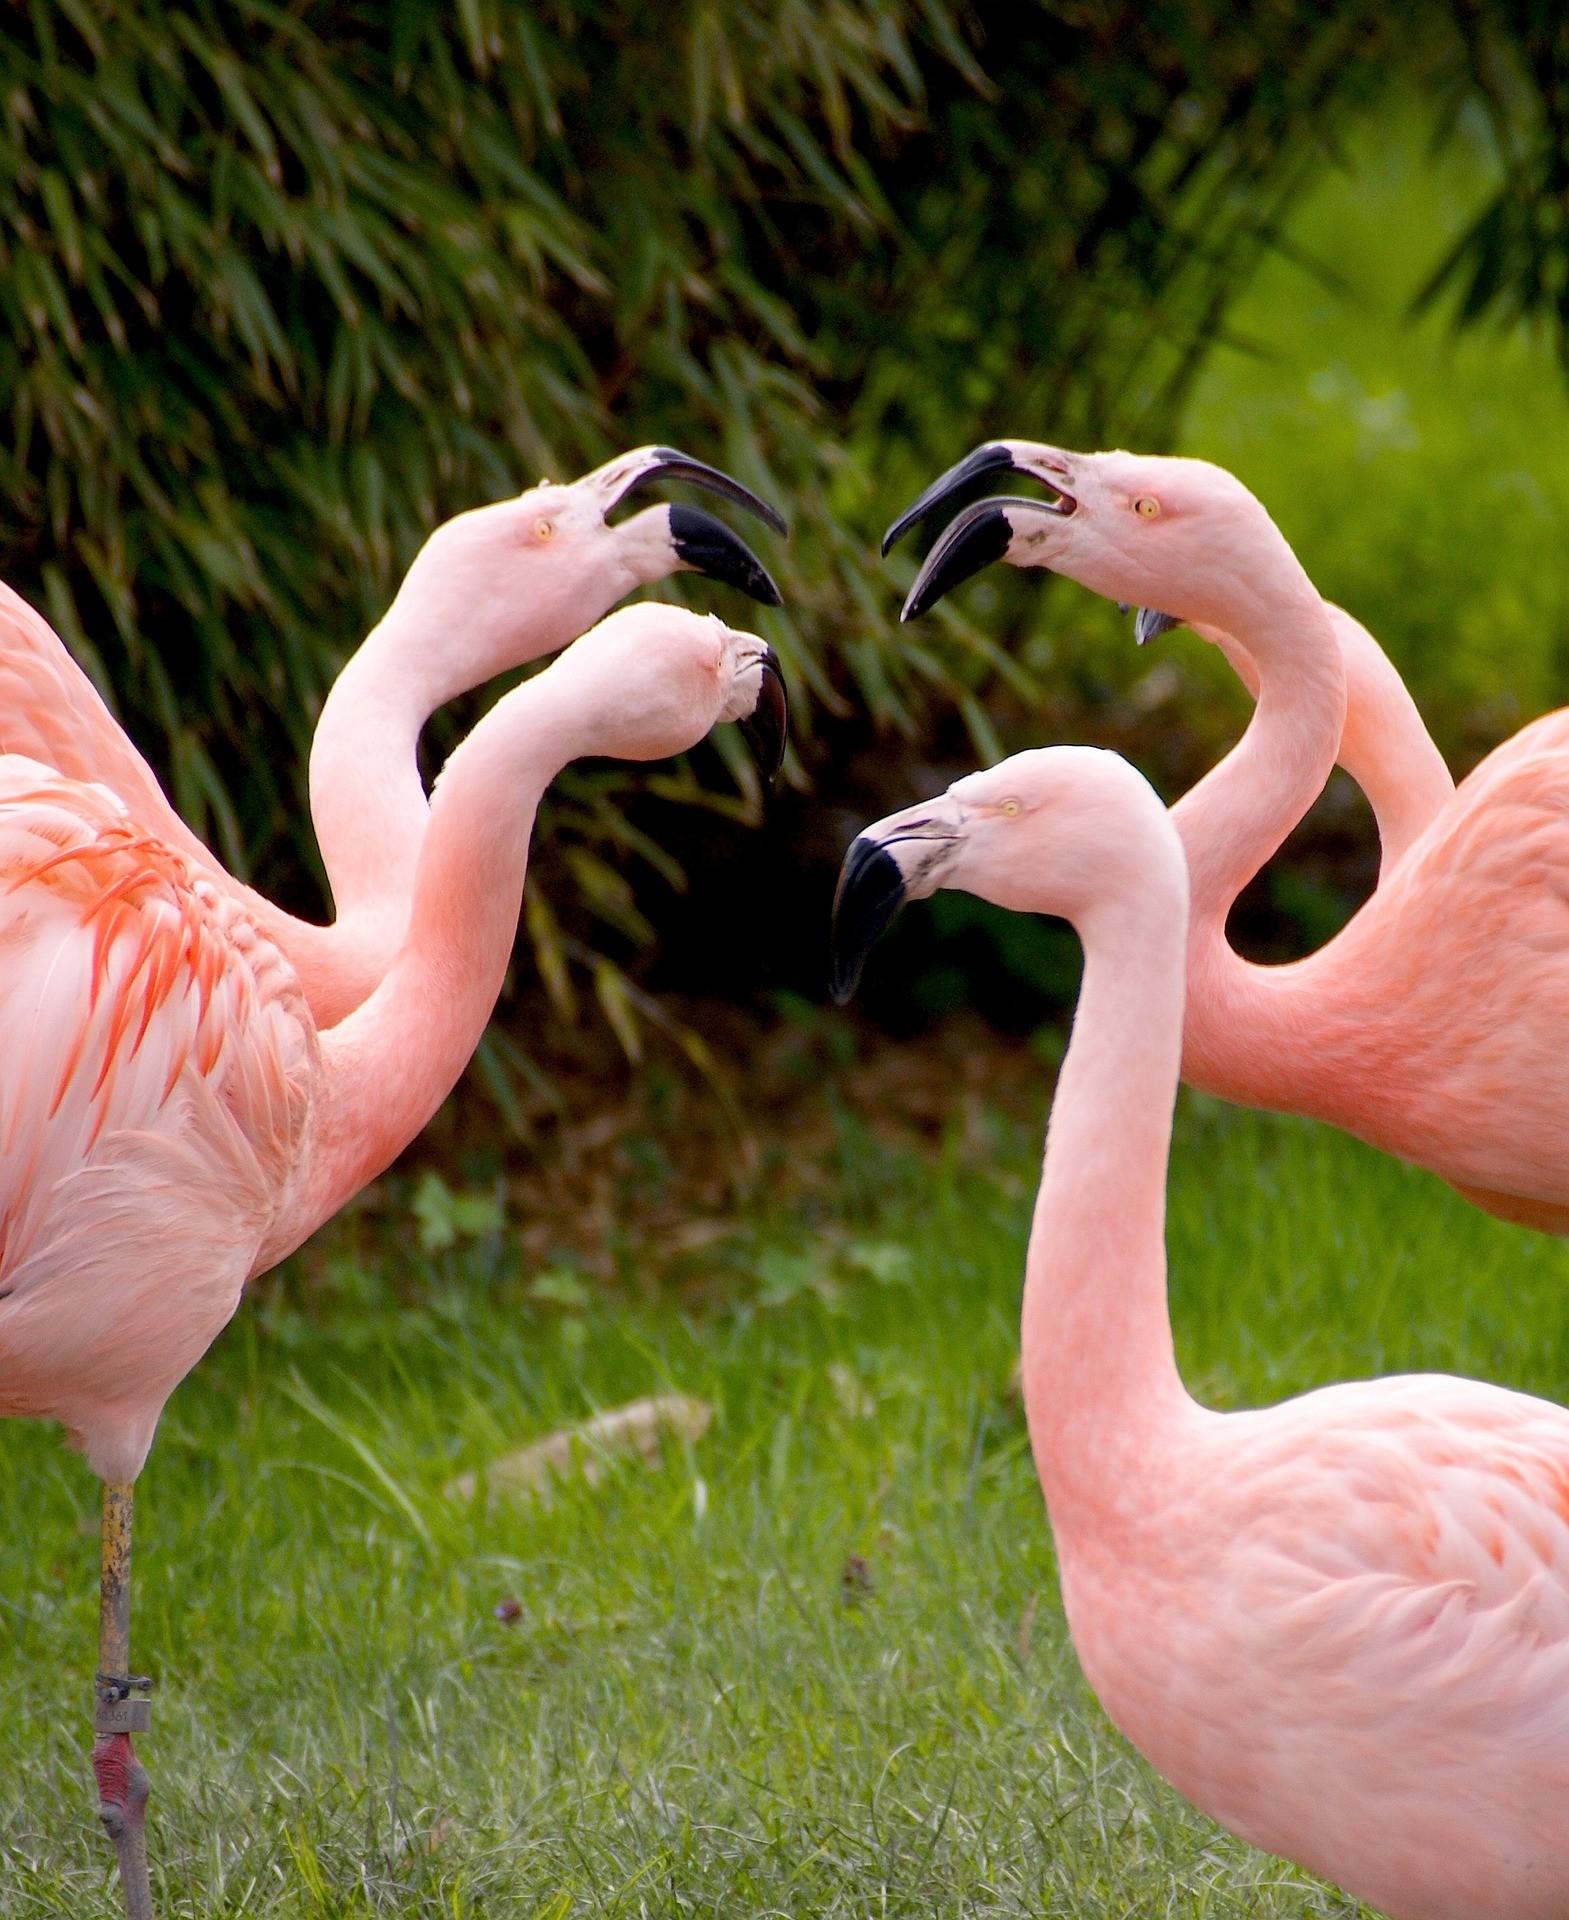 15478194754606939_by_hans3595_flamingos-1335042_1920